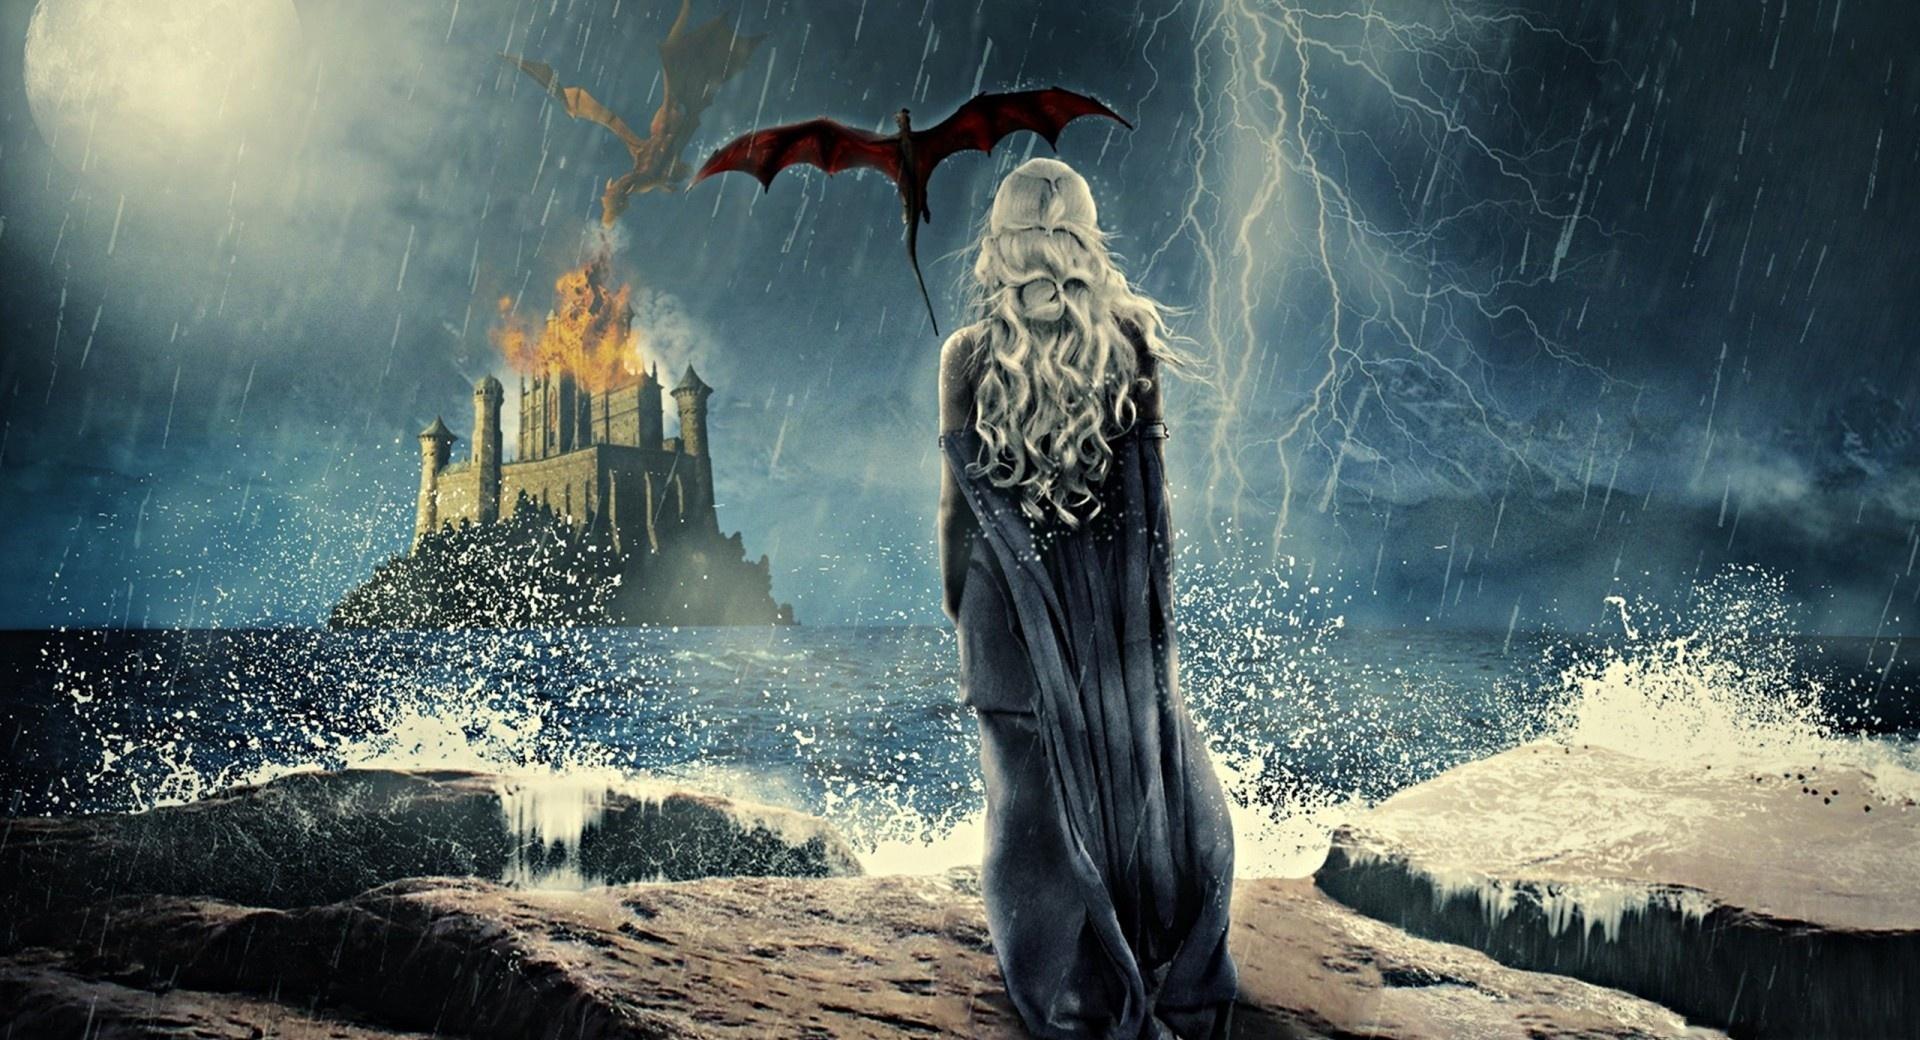 Daenerys Targaryen Painting wallpapers HD quality